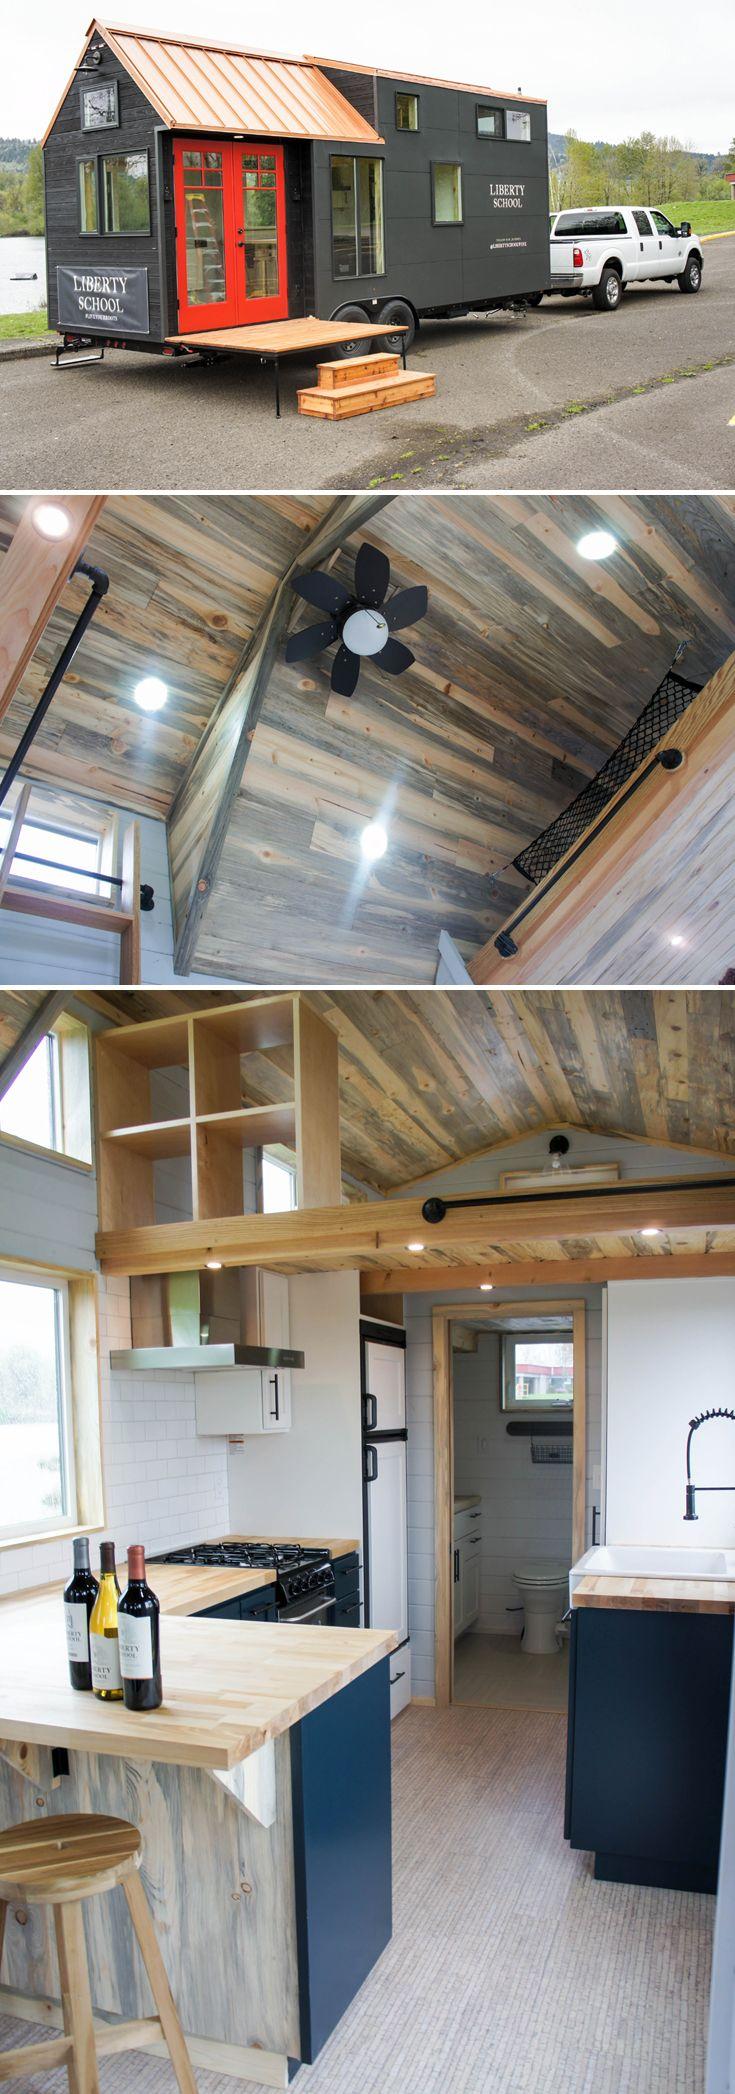 Bedroom tiny home plans on wheels furthermore romeo 500 sq ft log - Kootenay Wine Tasting Room By Truform Tiny